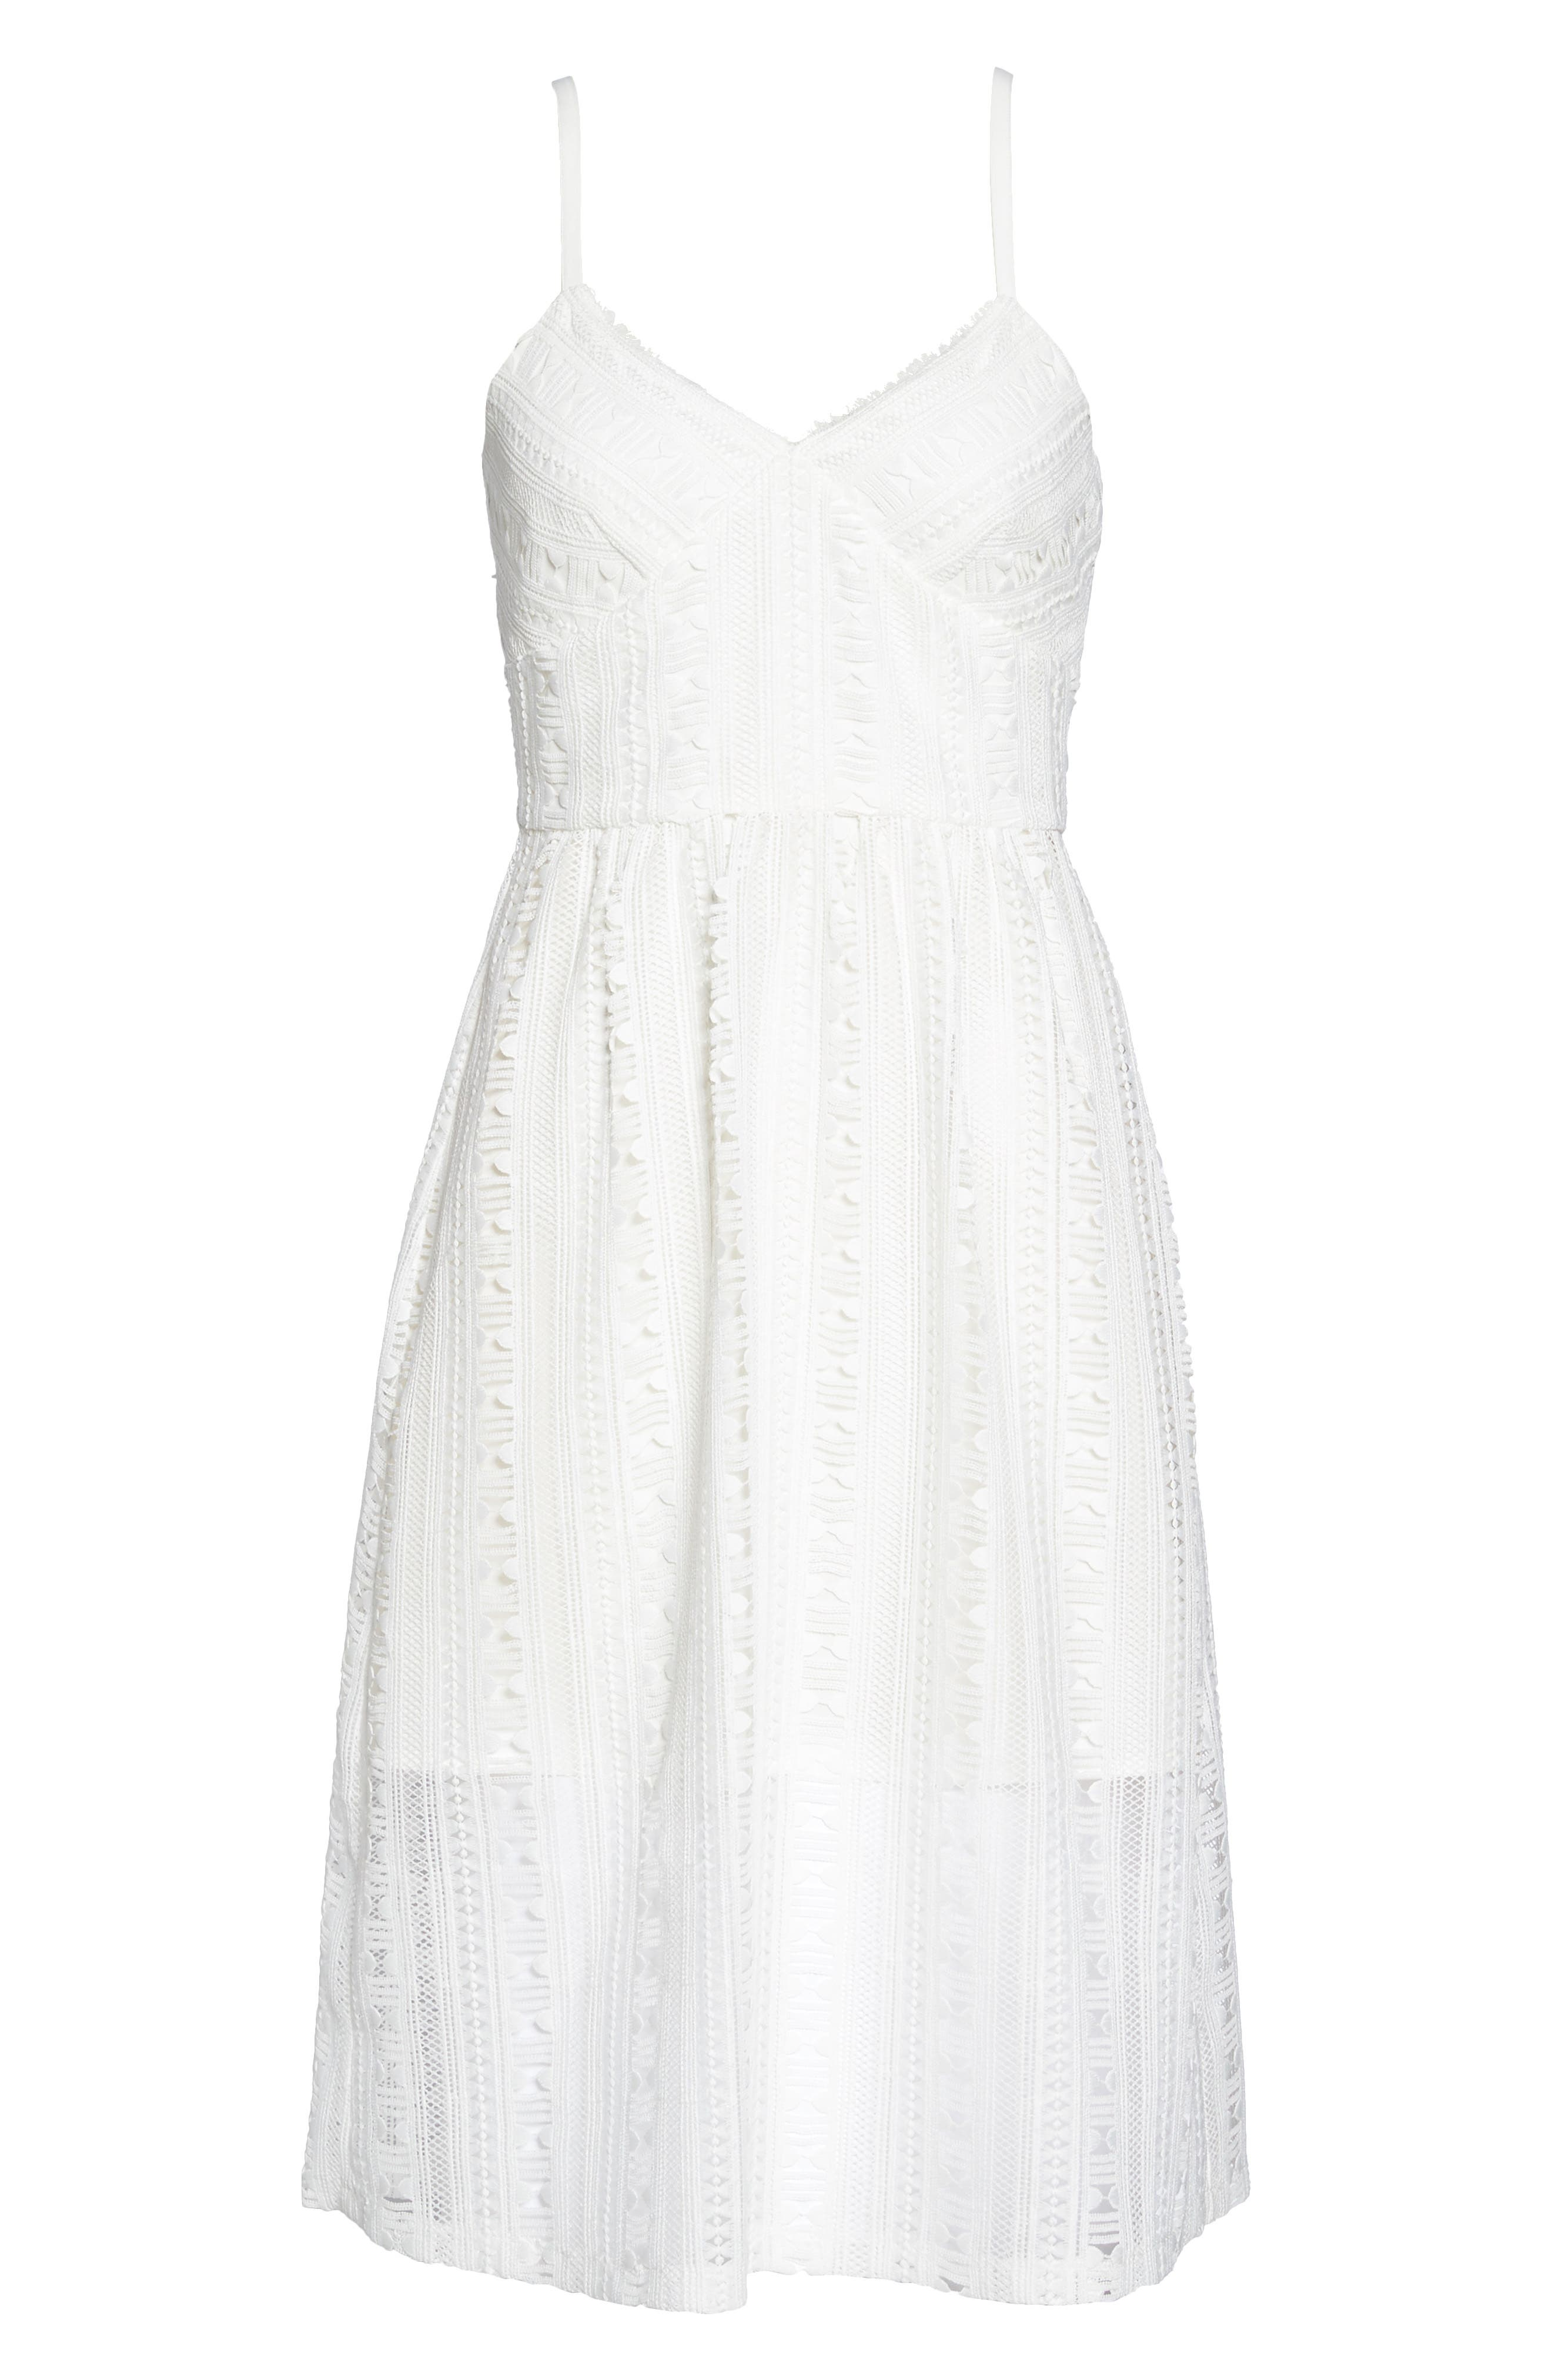 Belissimo Lace Fit & Flare Midi Dress,                             Alternate thumbnail 7, color,                             White